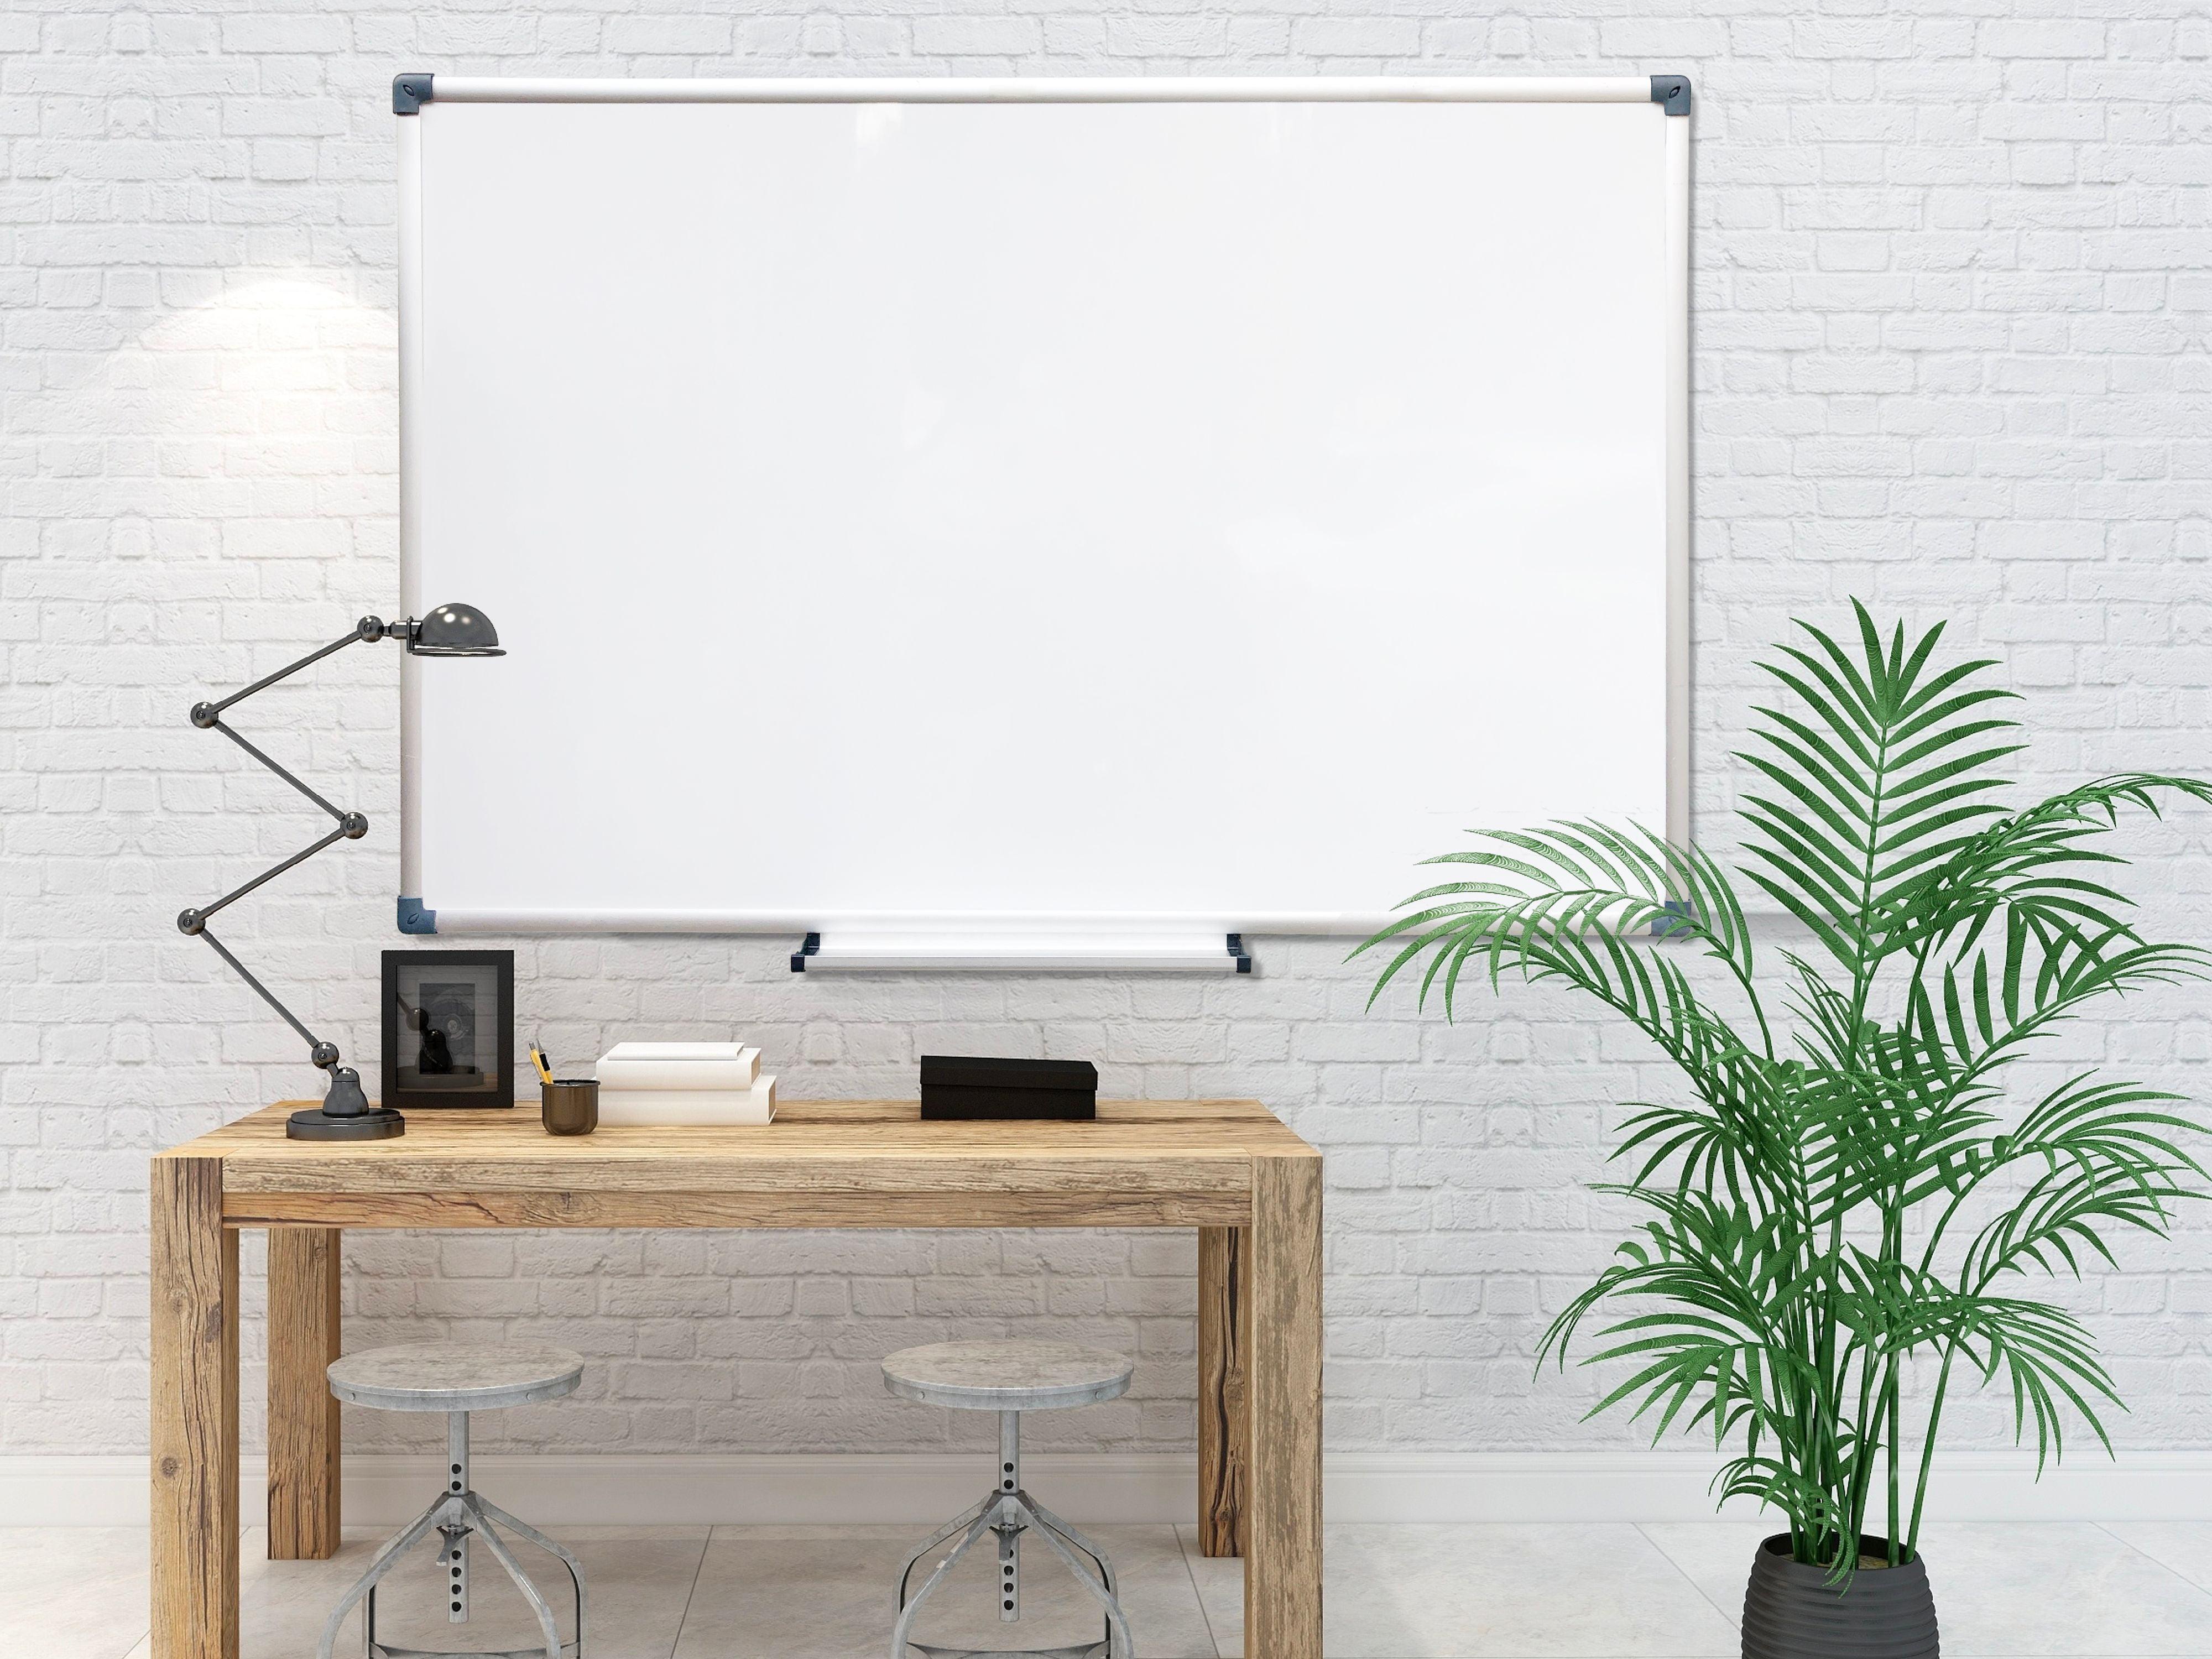 a0a7c4e41aa VIZ-PRO Cat-eye Magnetic Whiteboard   Dry Erase Board